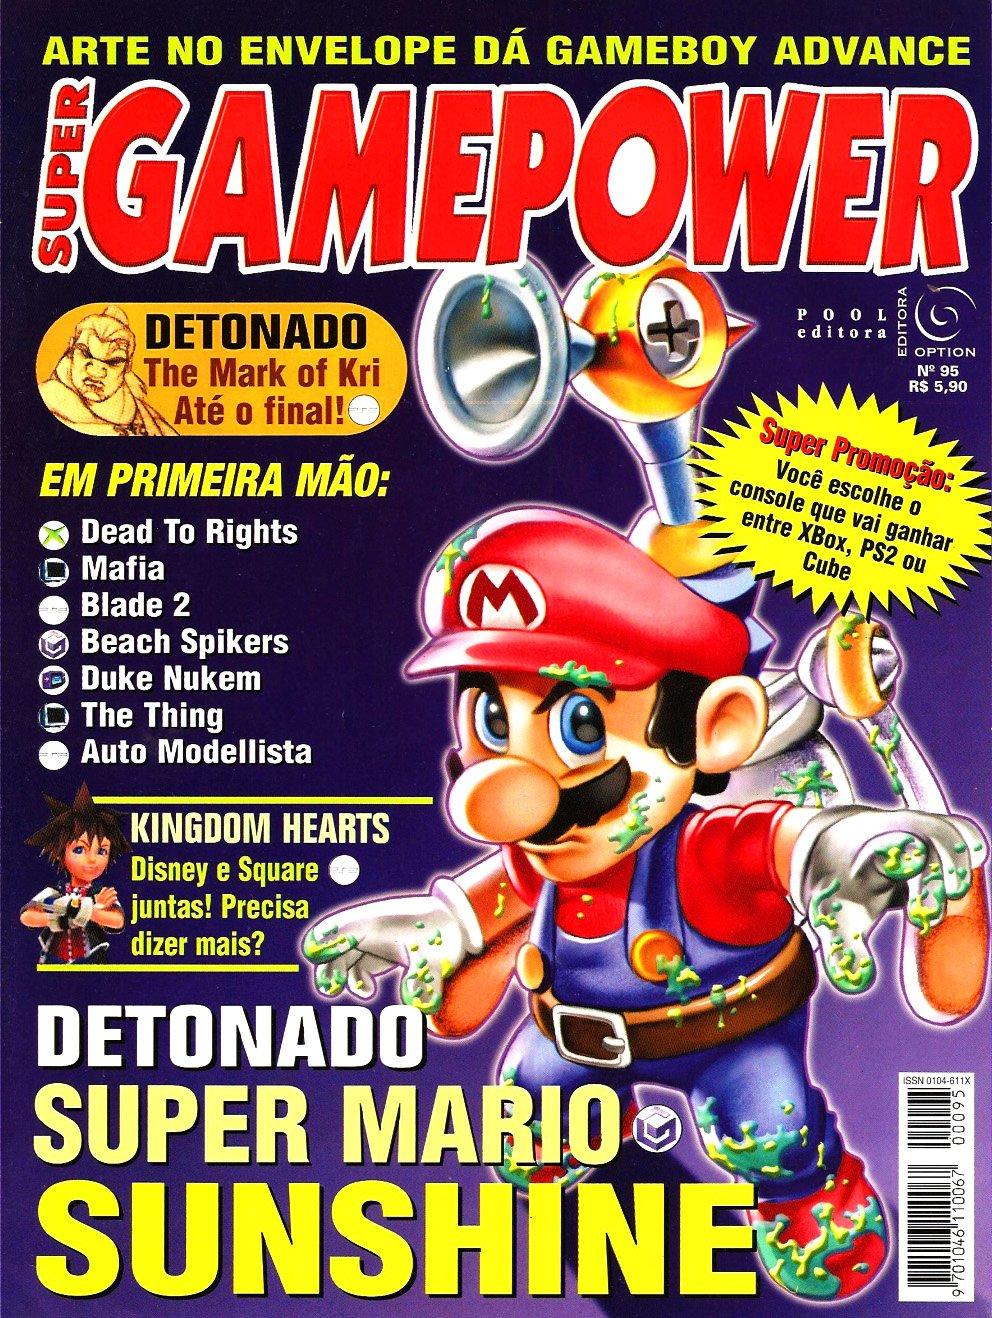 SuperGamePower Issue 095 (September 2002)